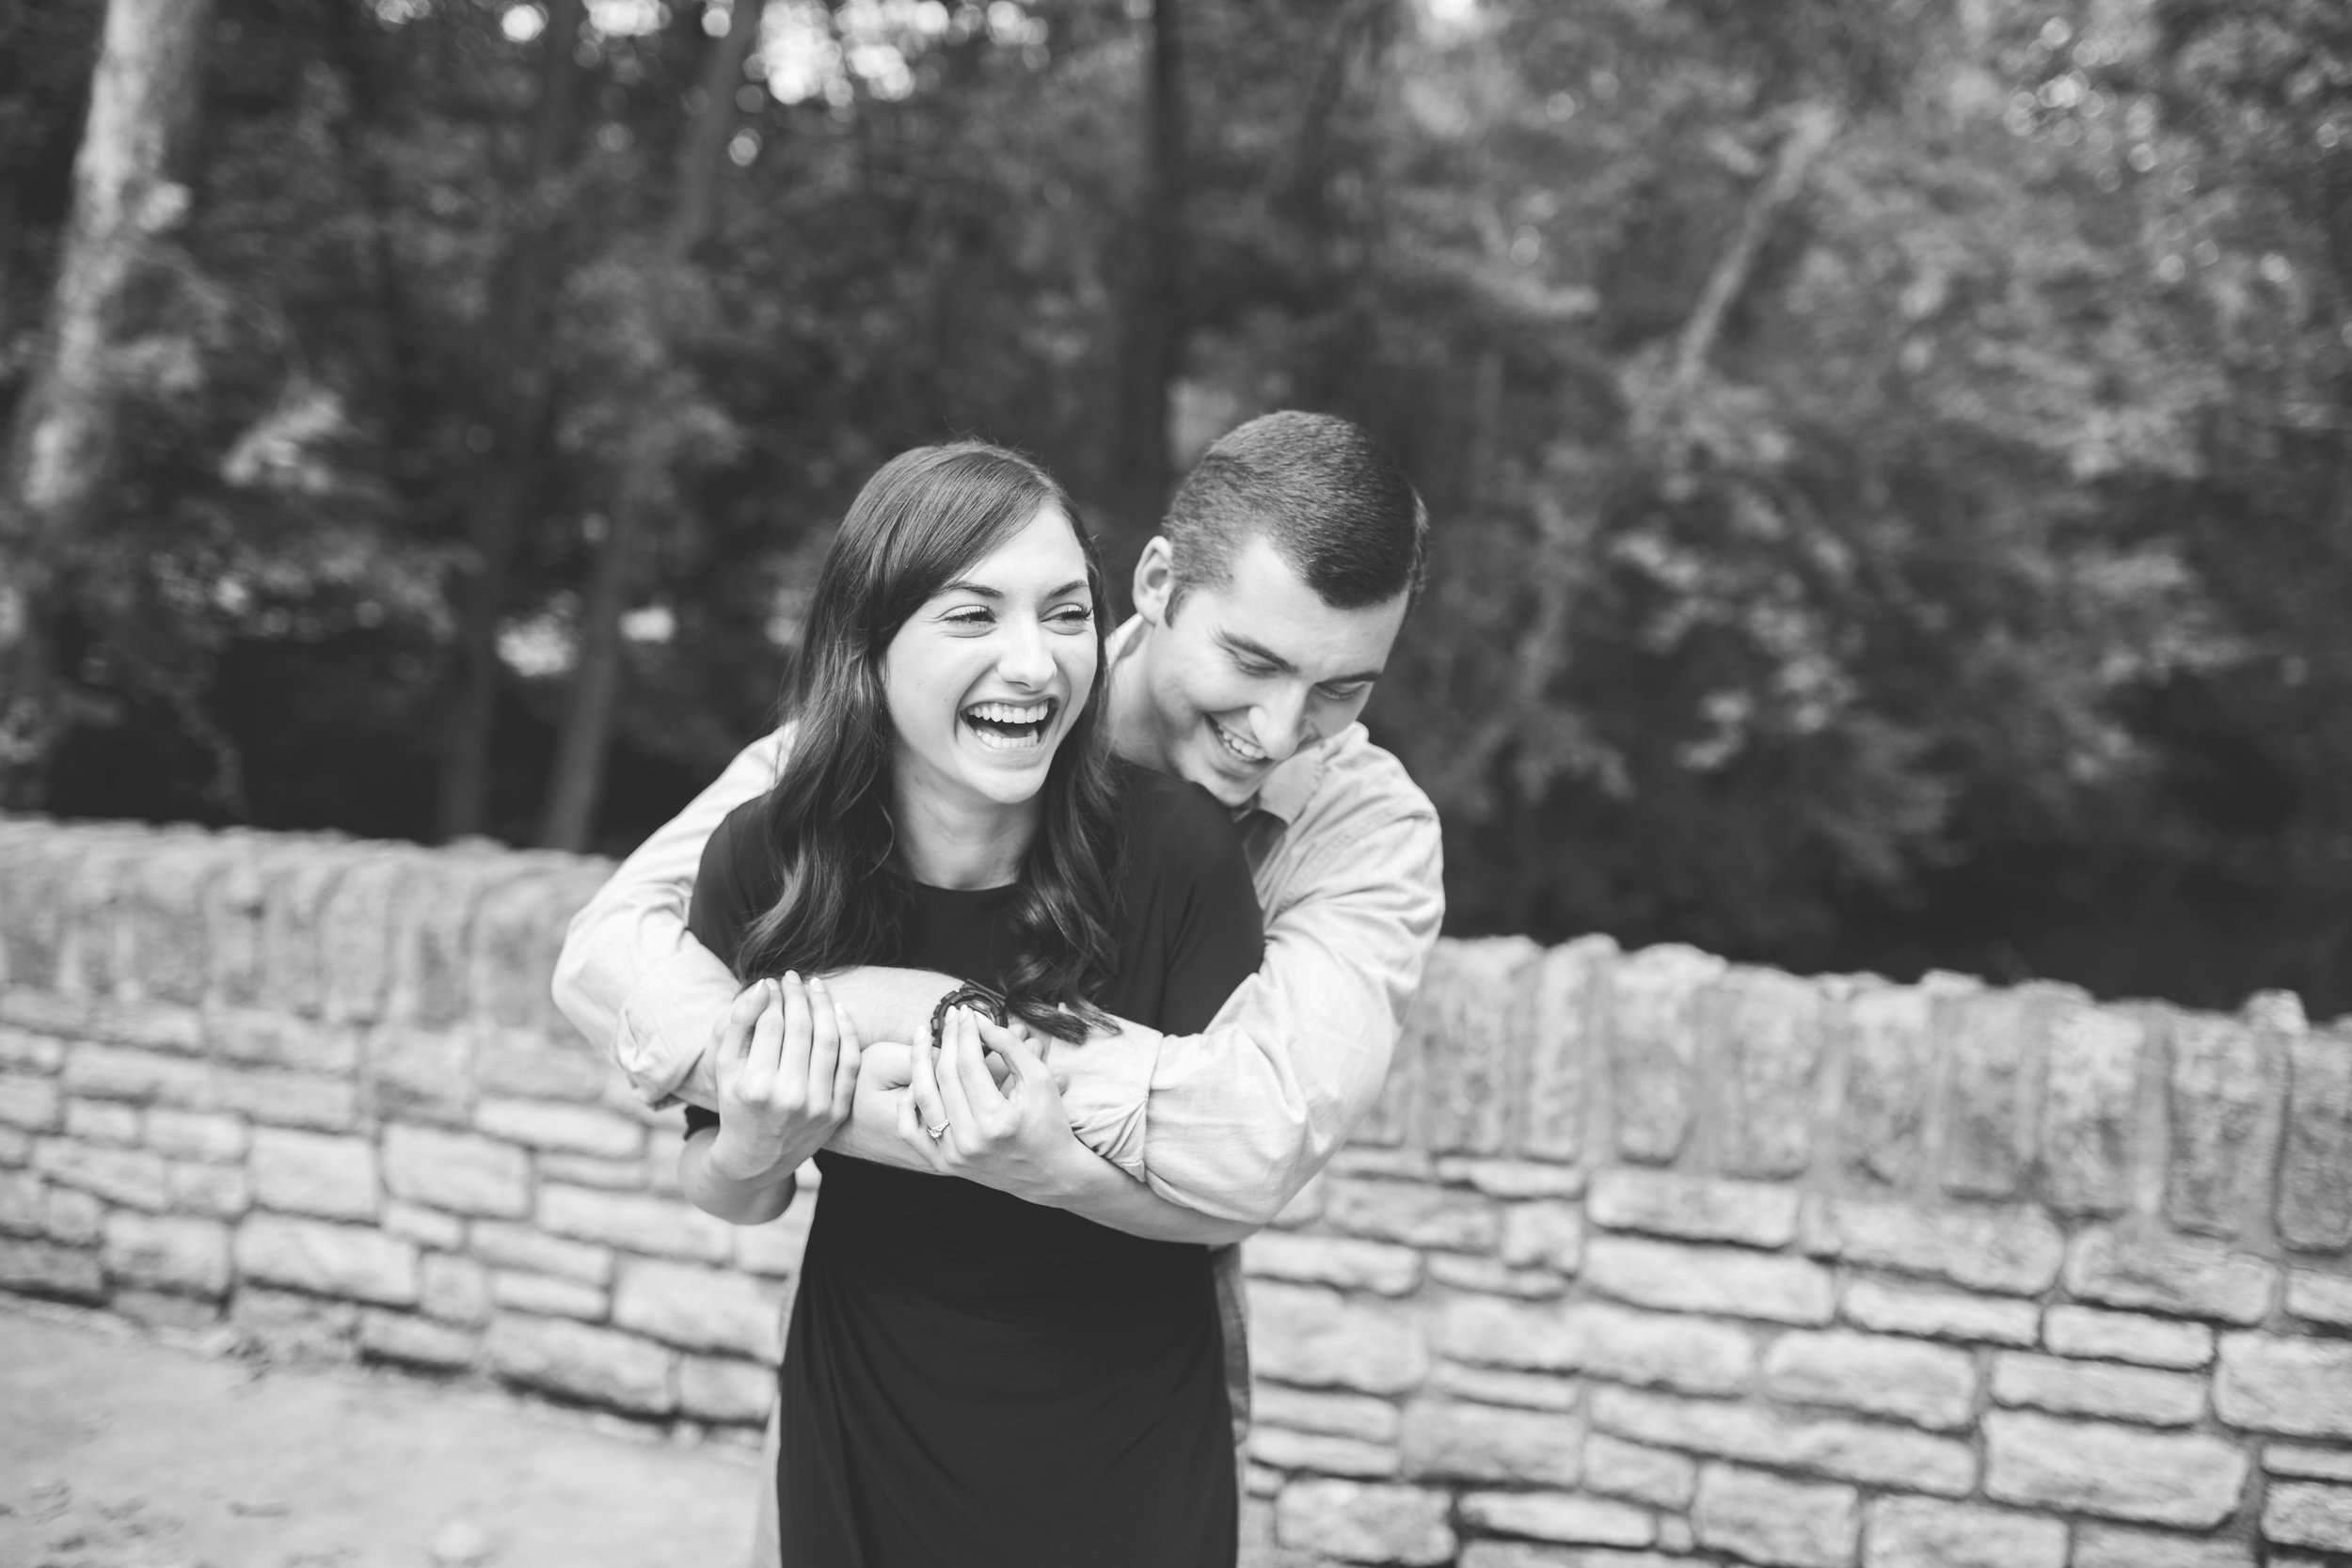 Bryce&Natalie022.jpg